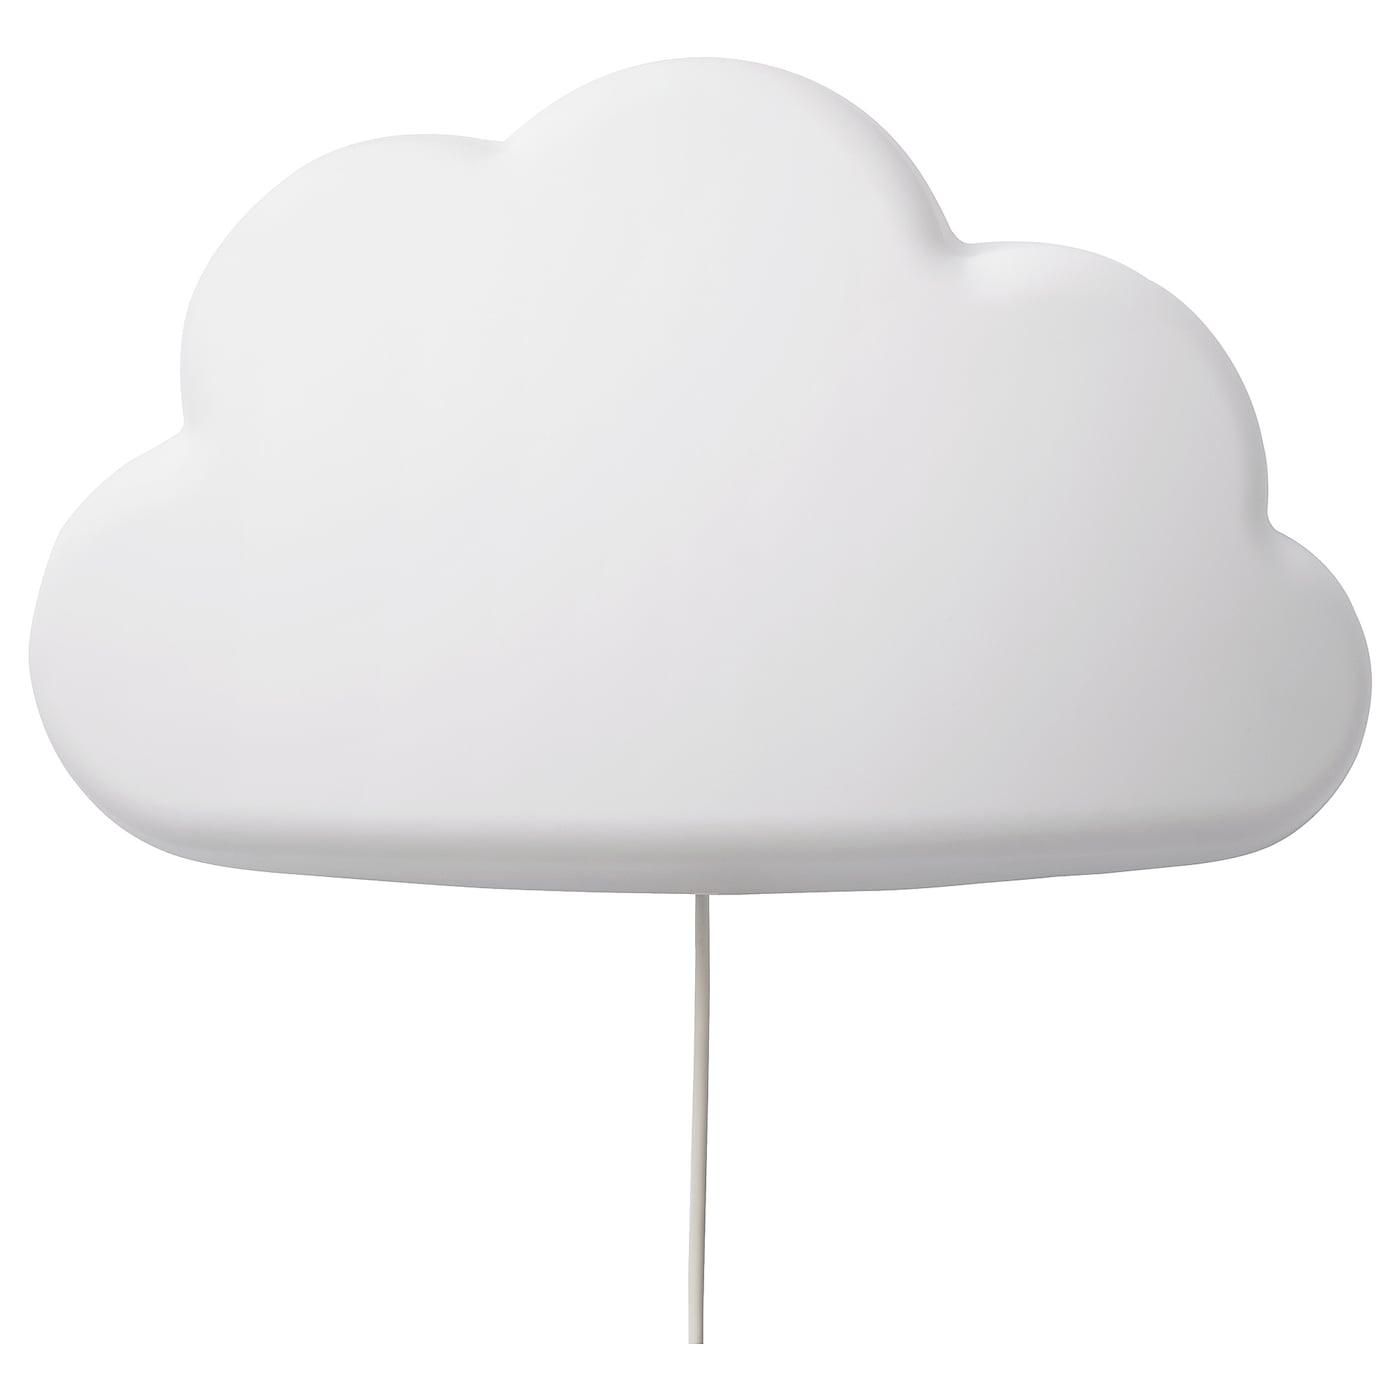 Upplyst Lampada Da Parete A Led Nuvola Bianco Ikea Svizzera